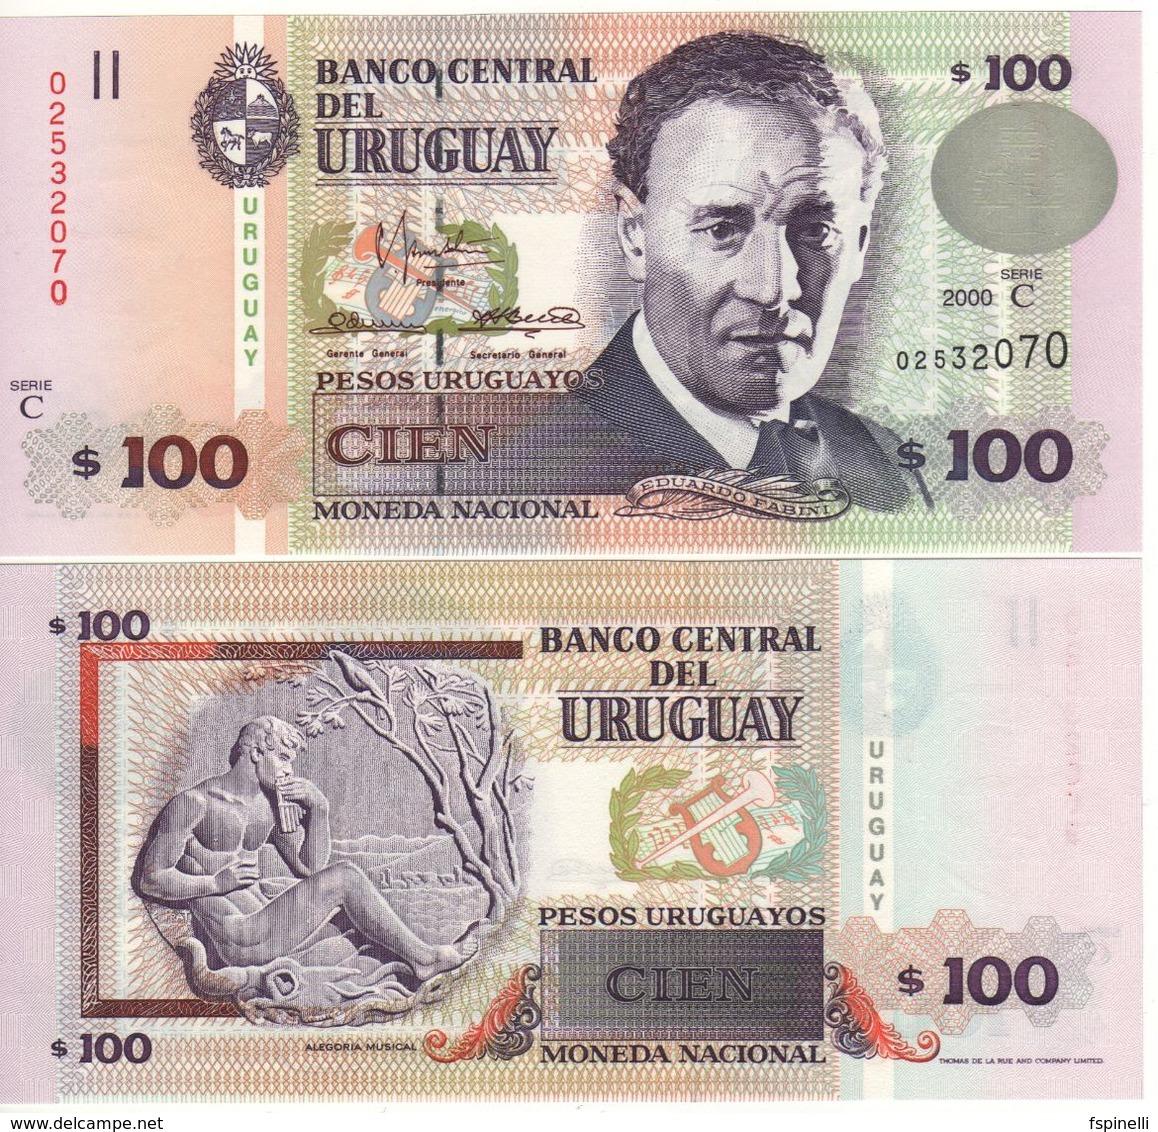 URUGUAY  100 Pesos Uruguayos    P76b   Dated 2000   UNC - Uruguay